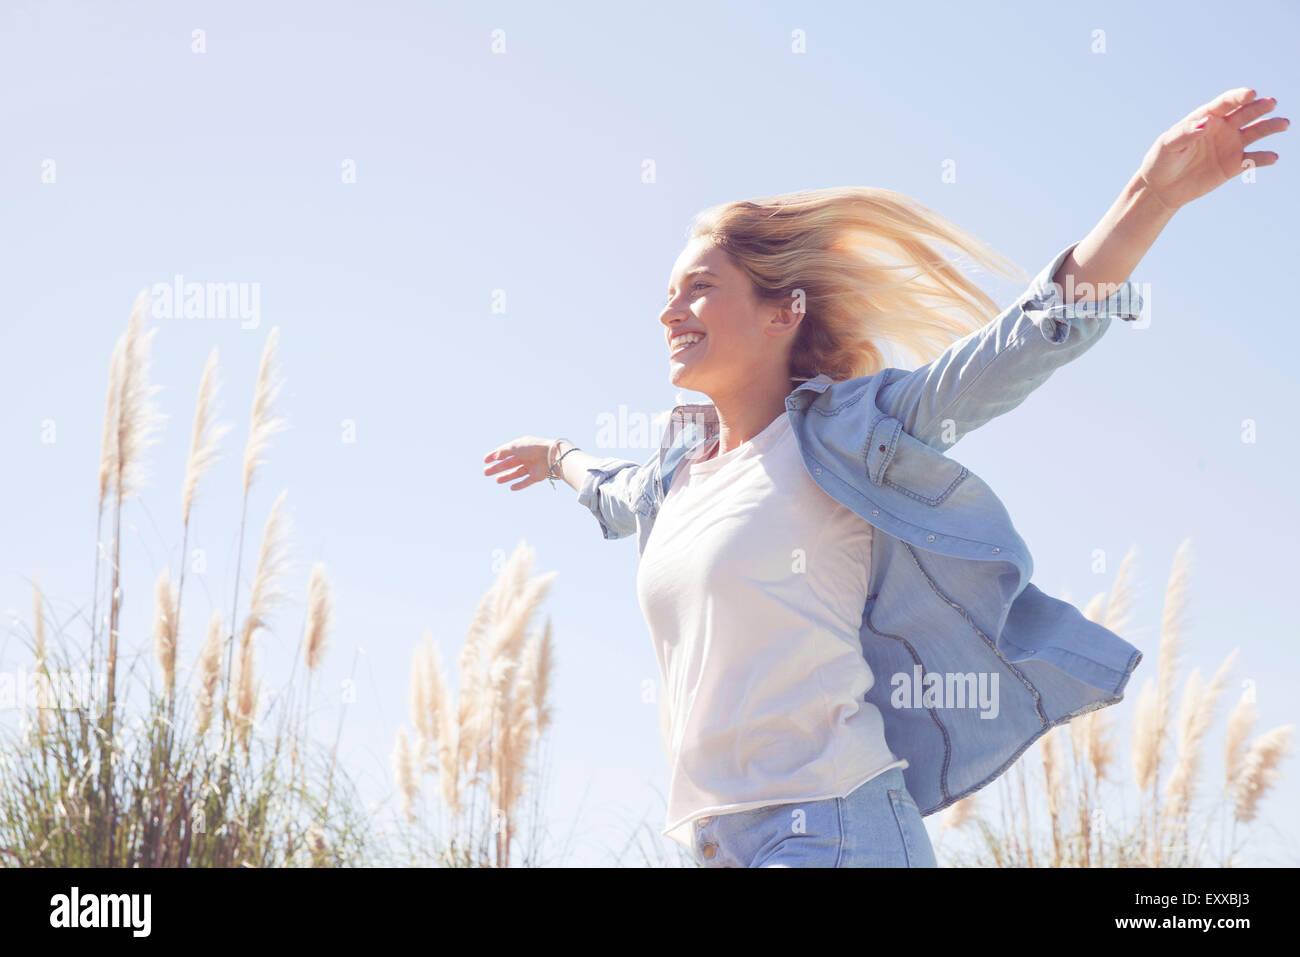 Woman enjoying fresh air outdoors - Stock Image